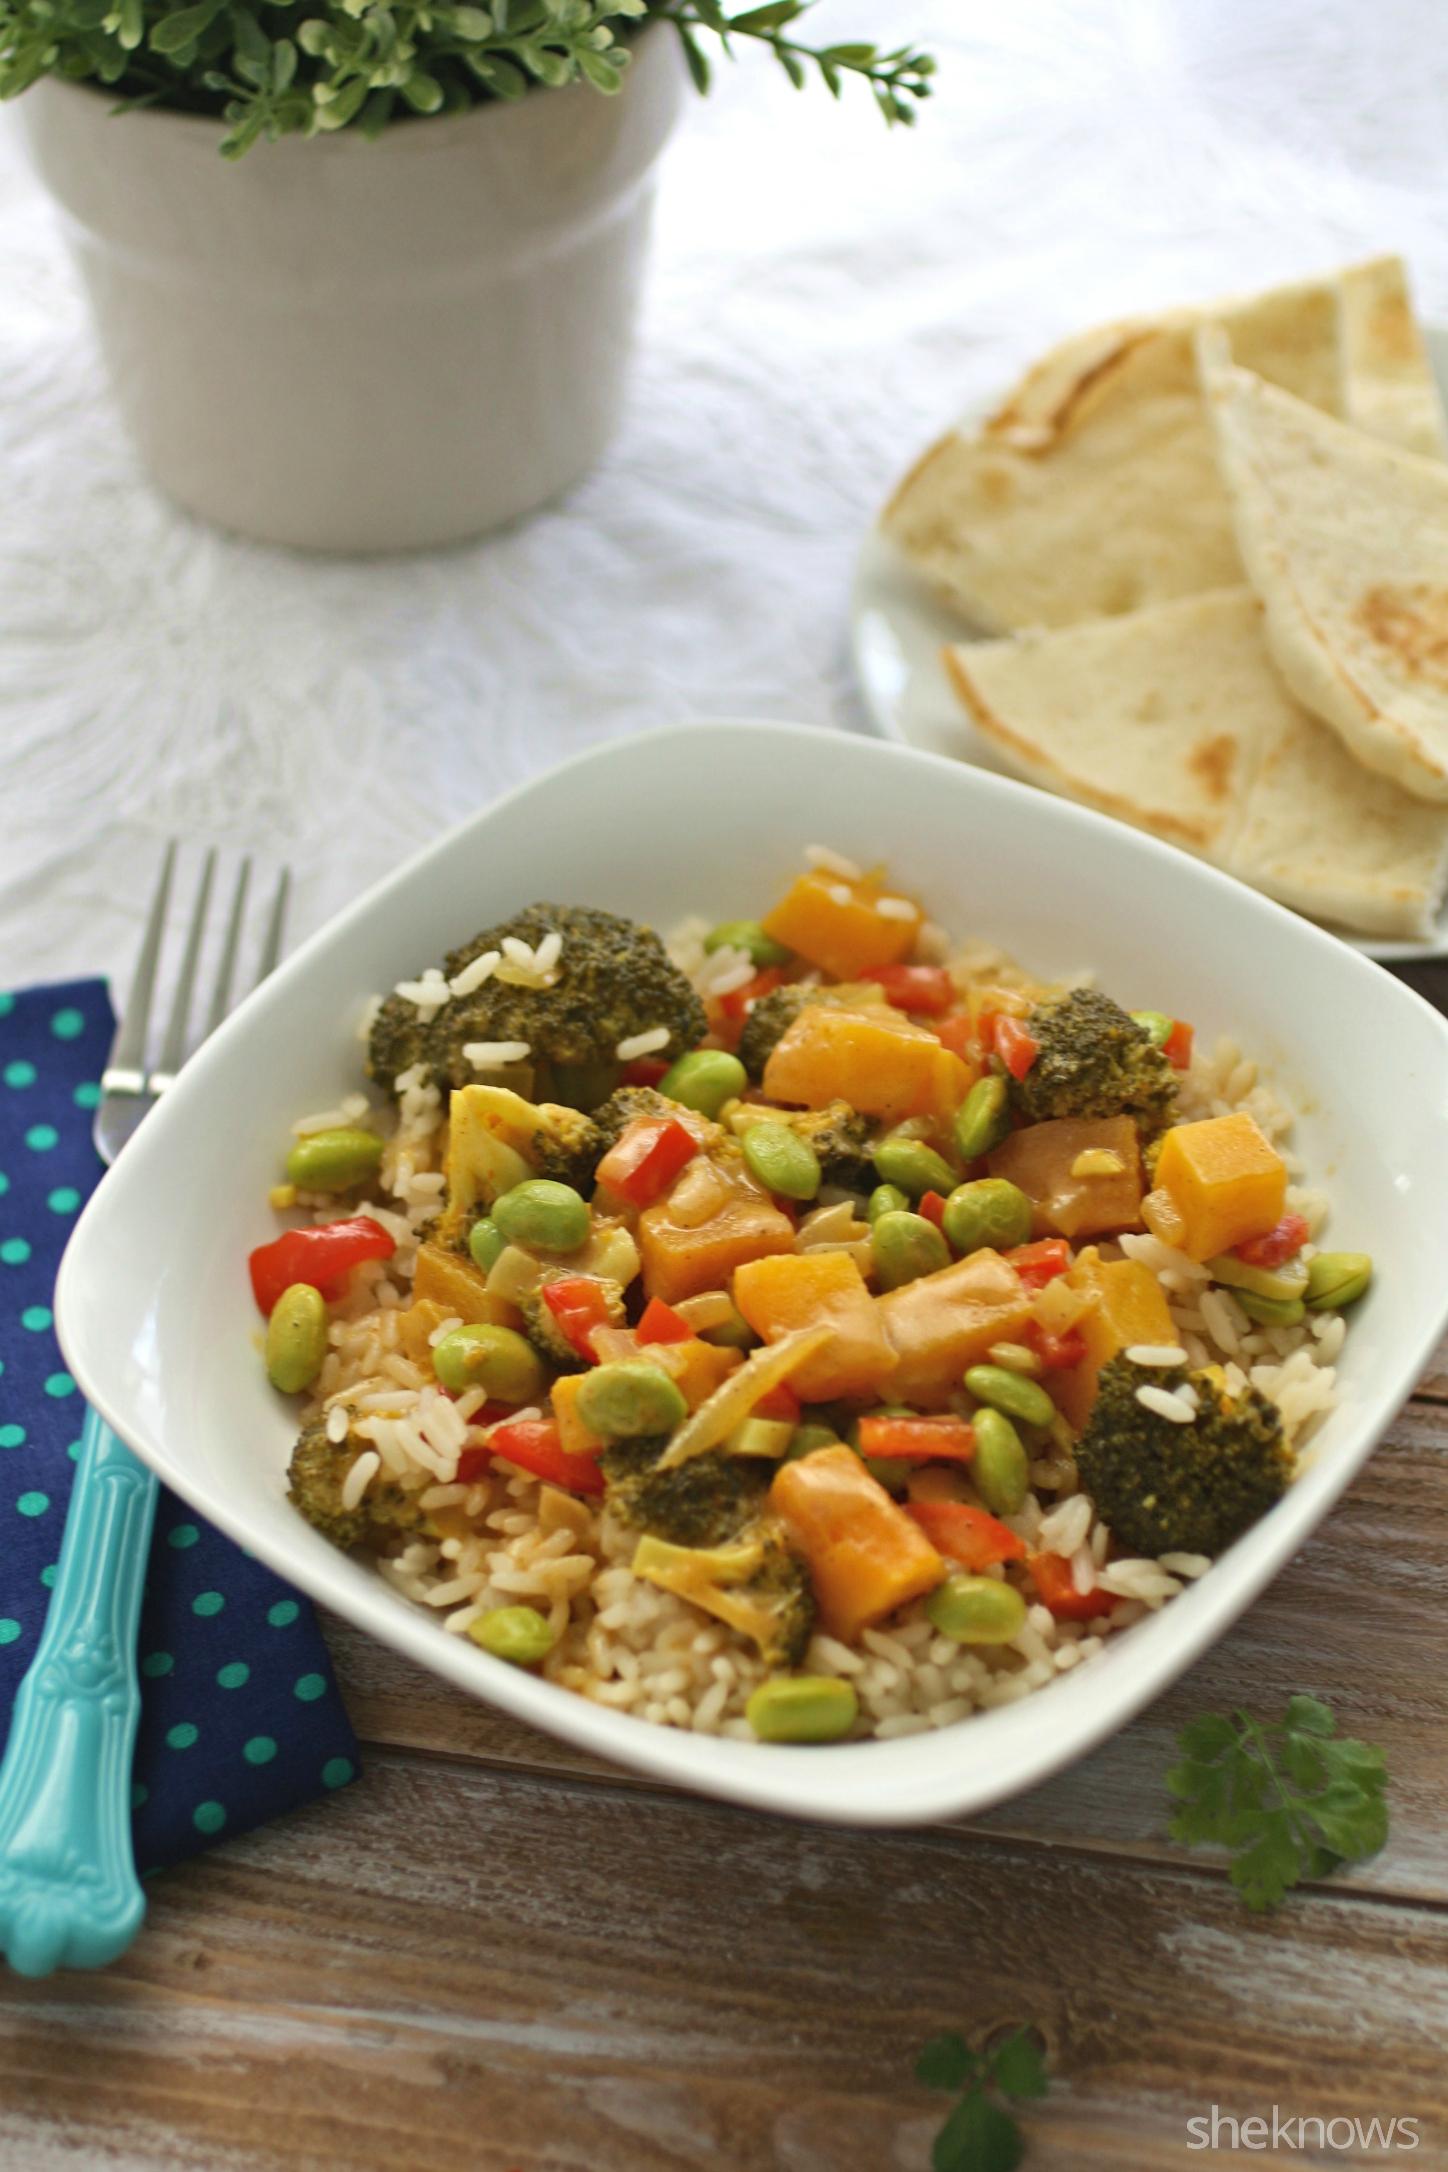 Enjoy a Meatless Monday dish like lightened up vegetable korma